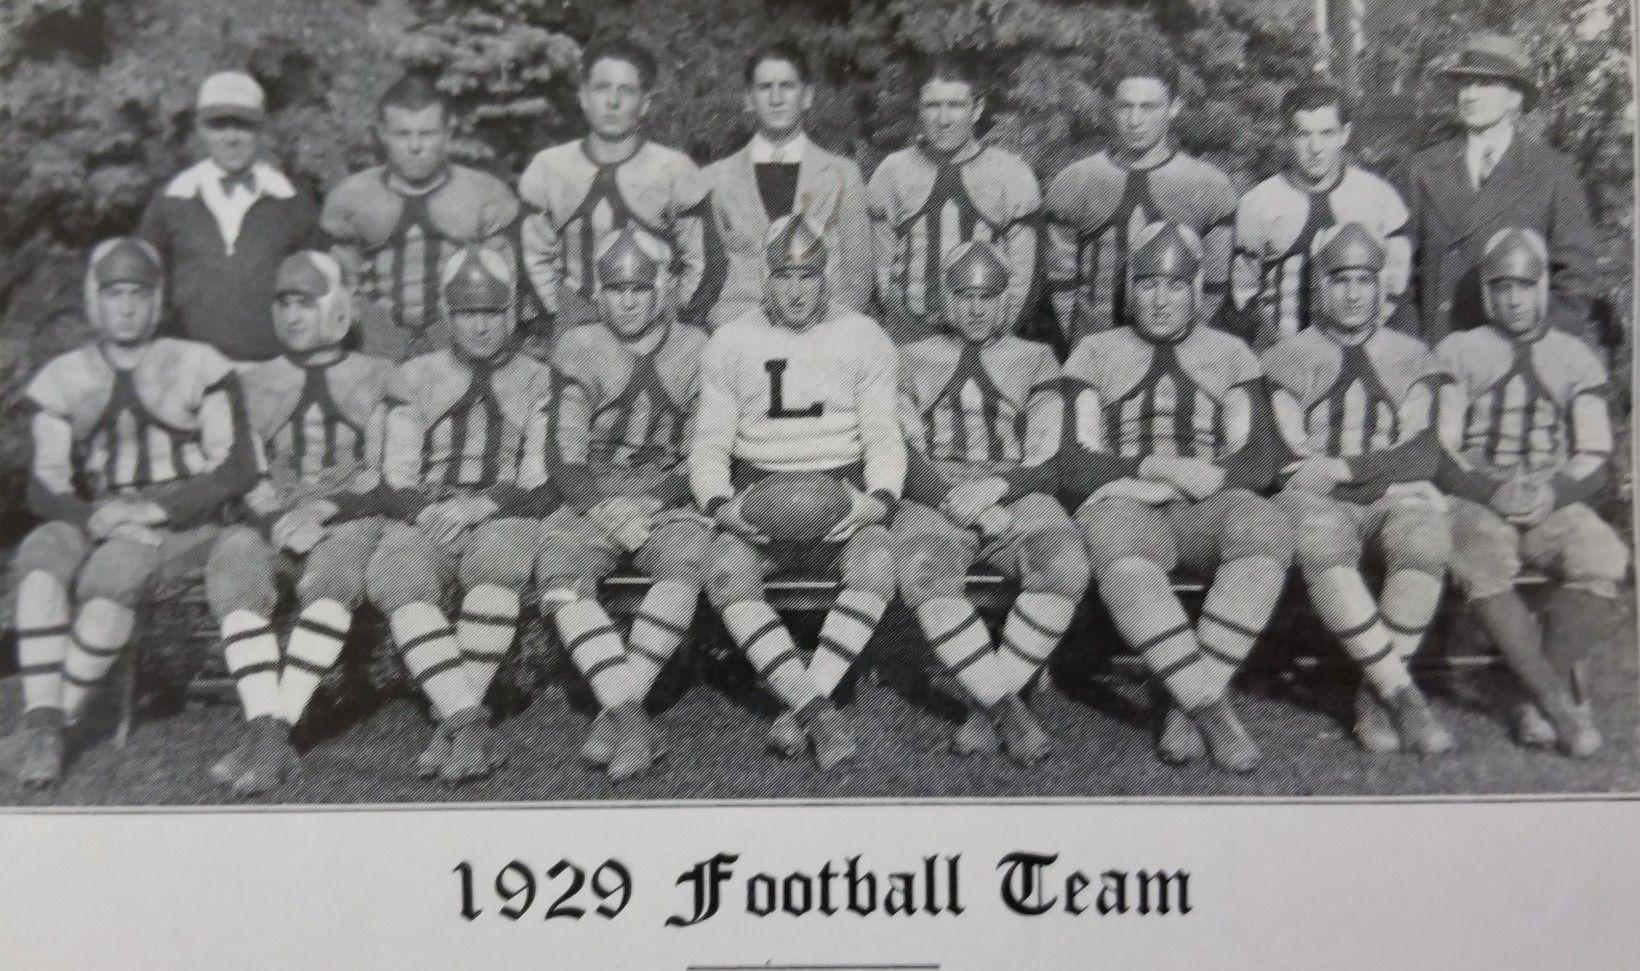 1929 lakewood piners football team photo source 1930